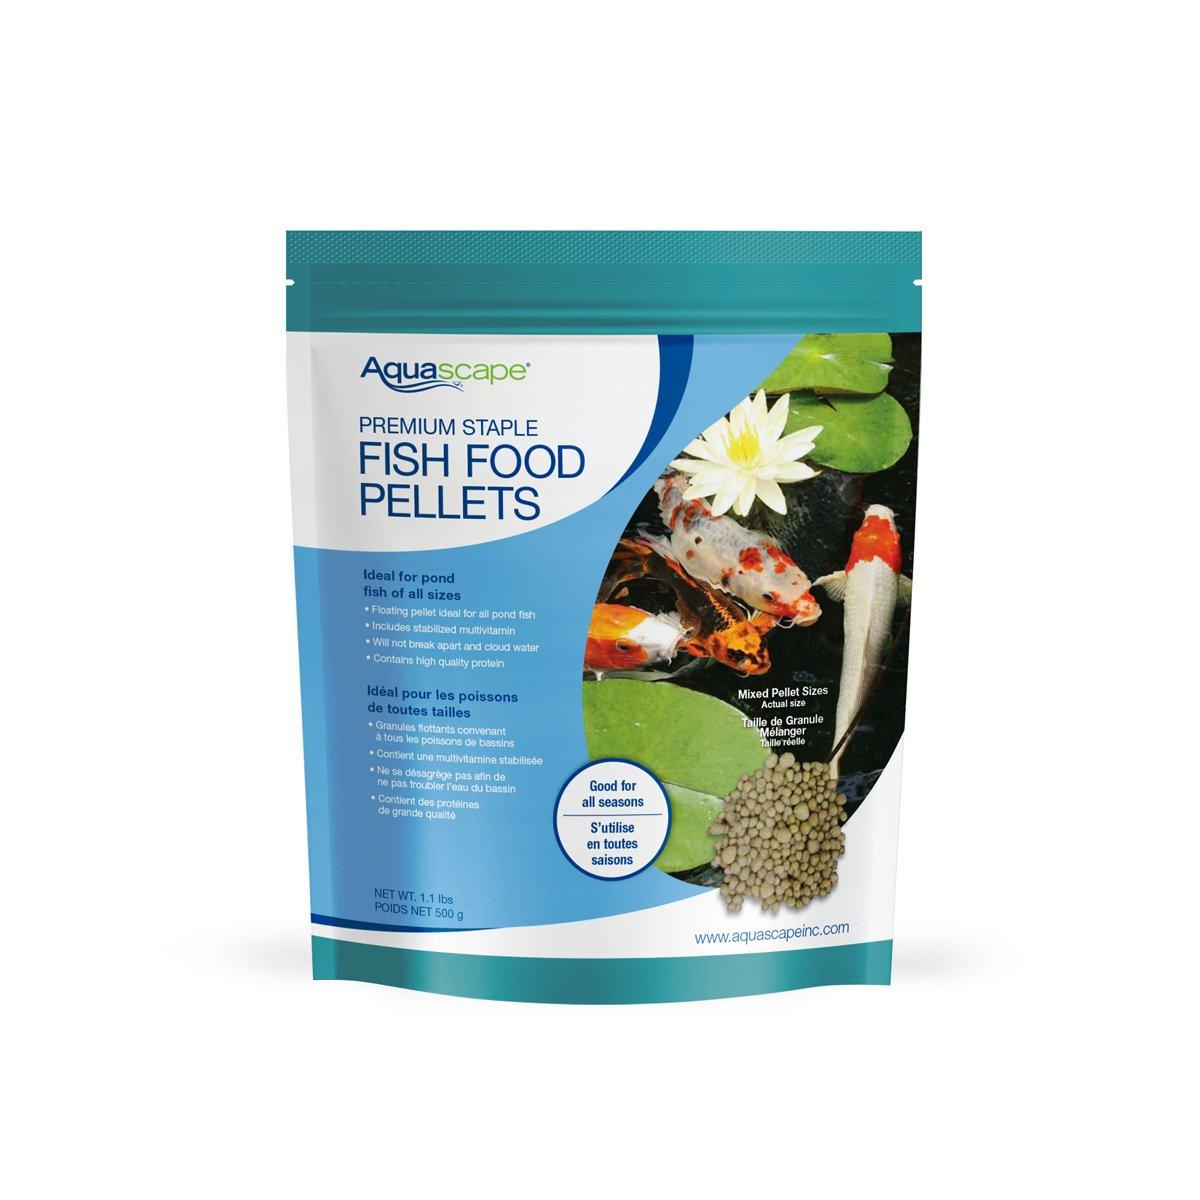 Aquascape Premium Staple Pond and Koi Fish Food, Mixed Pellet Size